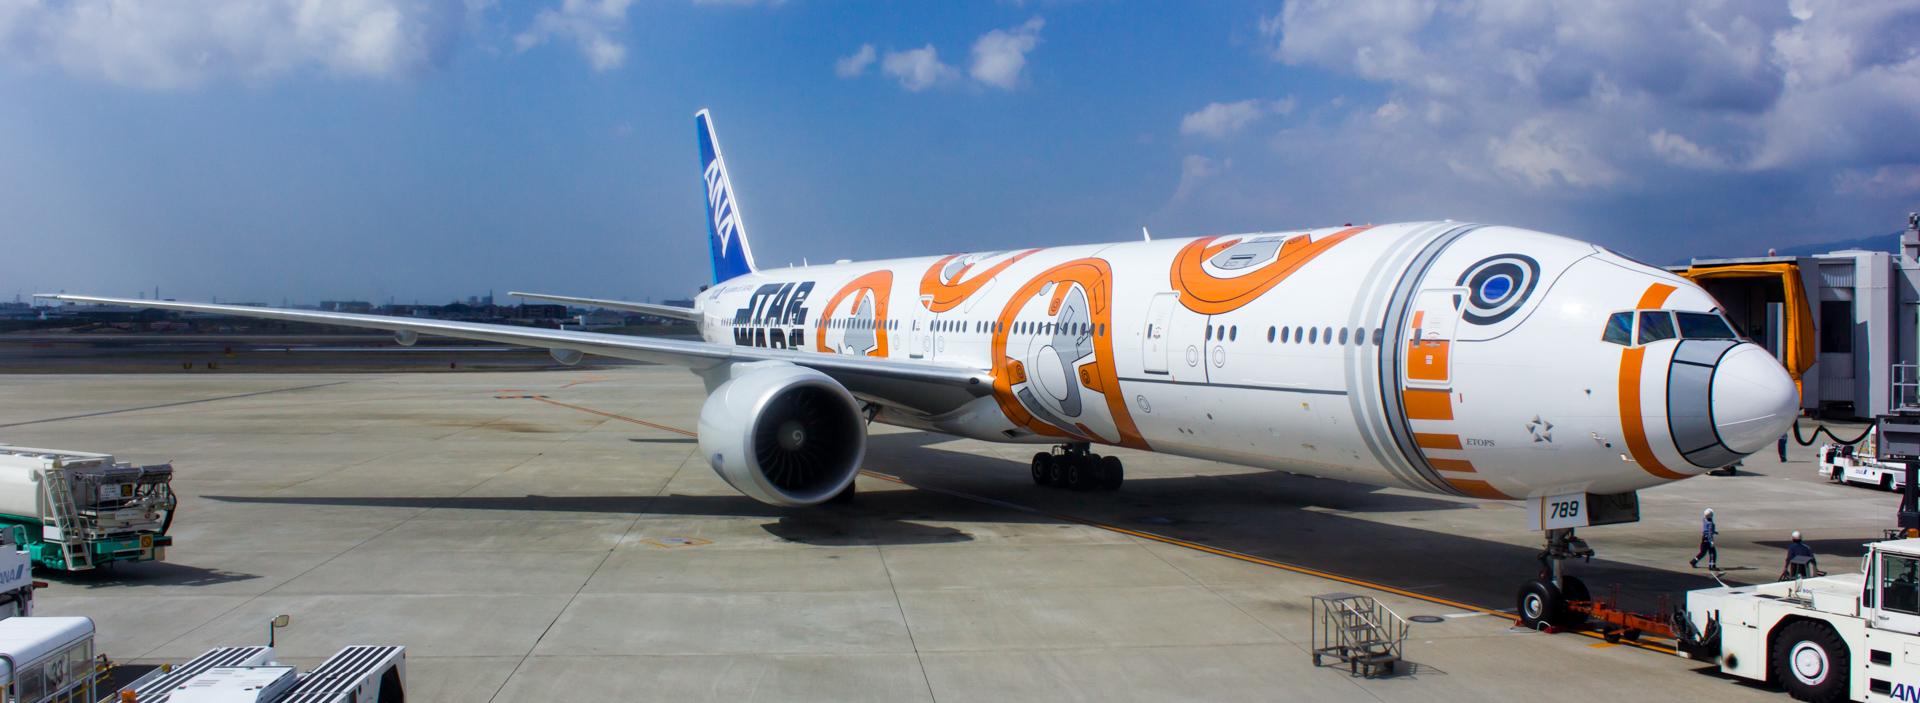 Star Wars BB-8™ ANA Jet Pt. 2: The Inaugural